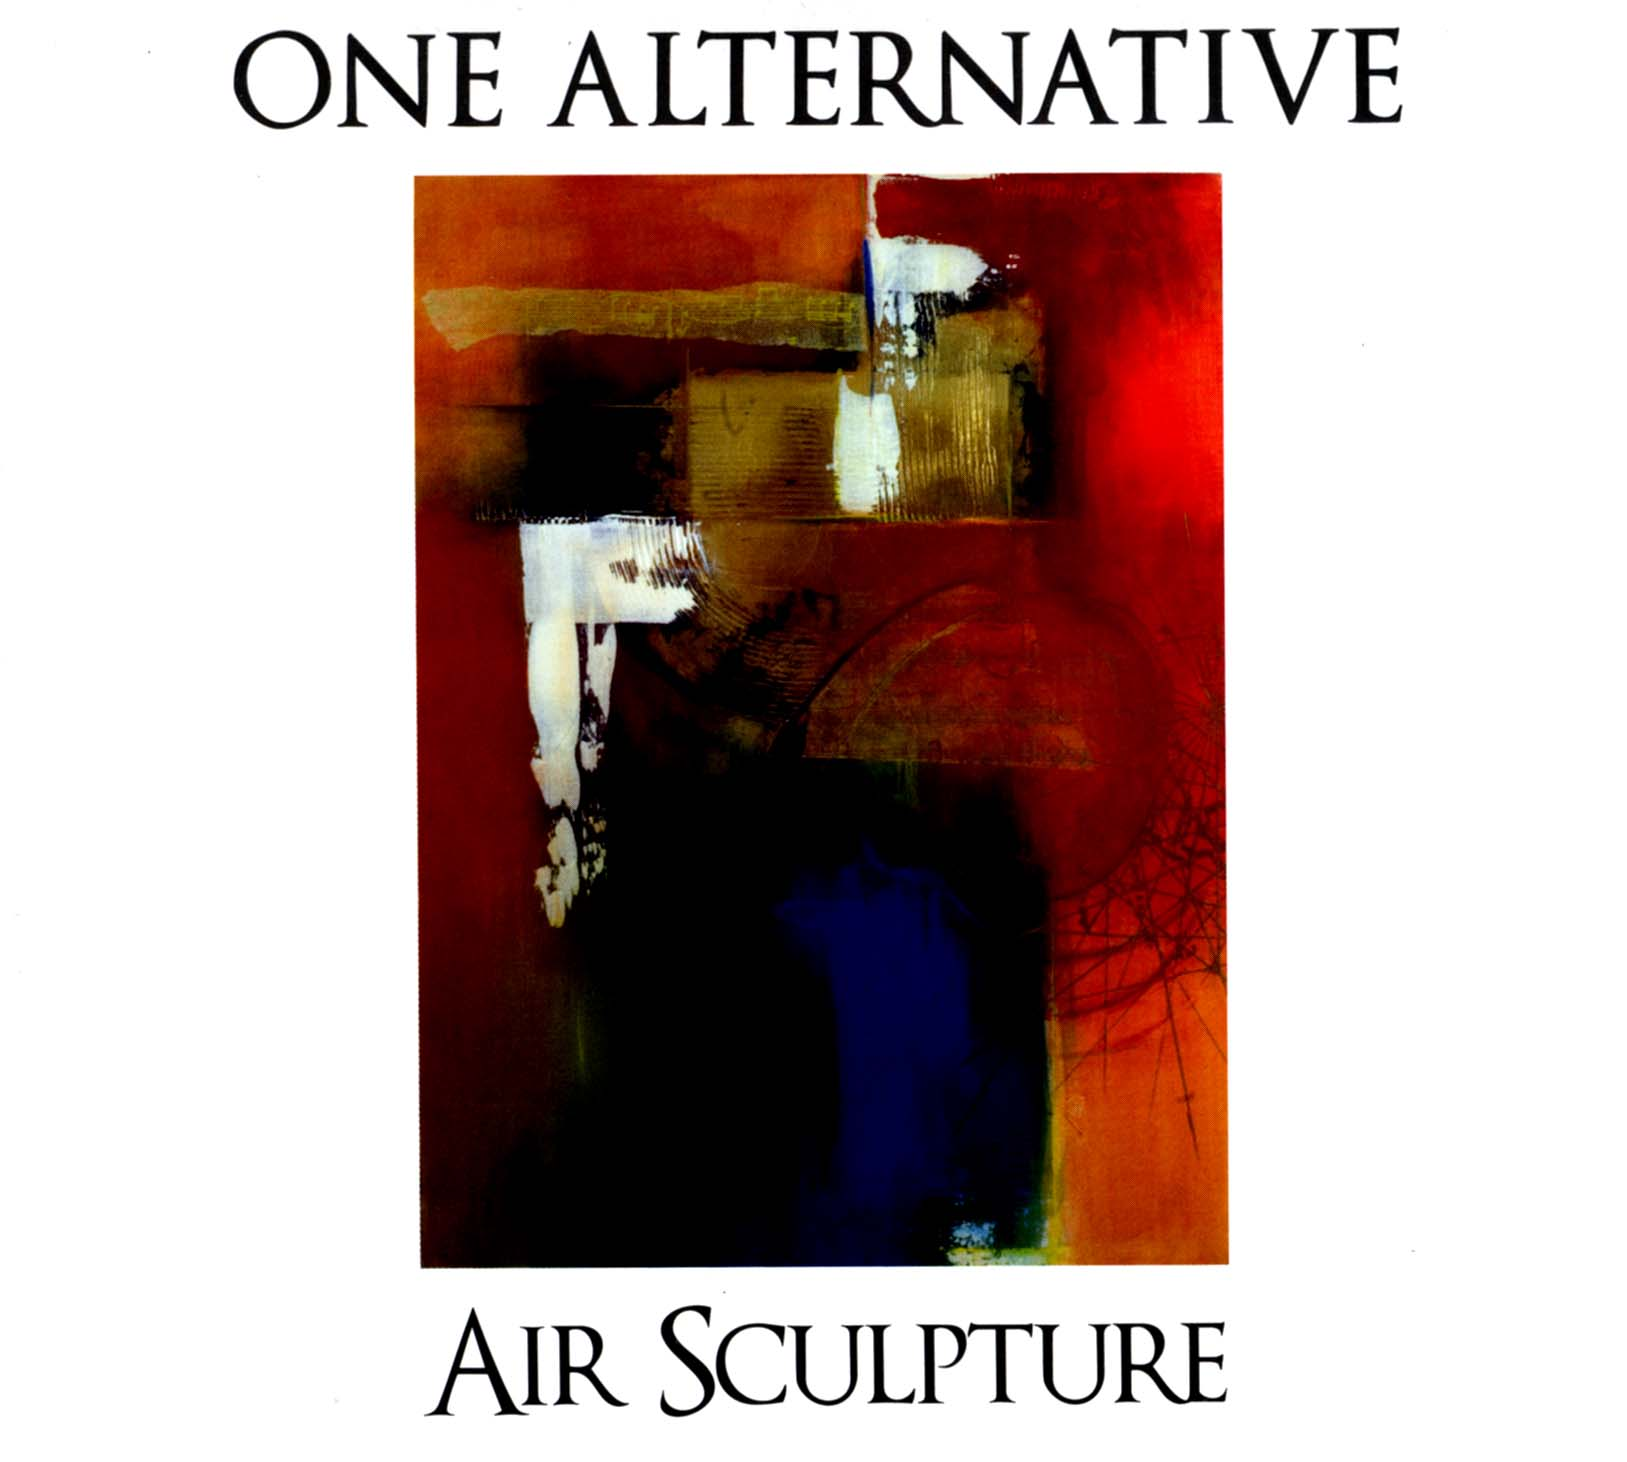 One Alternative: Air Sculpture